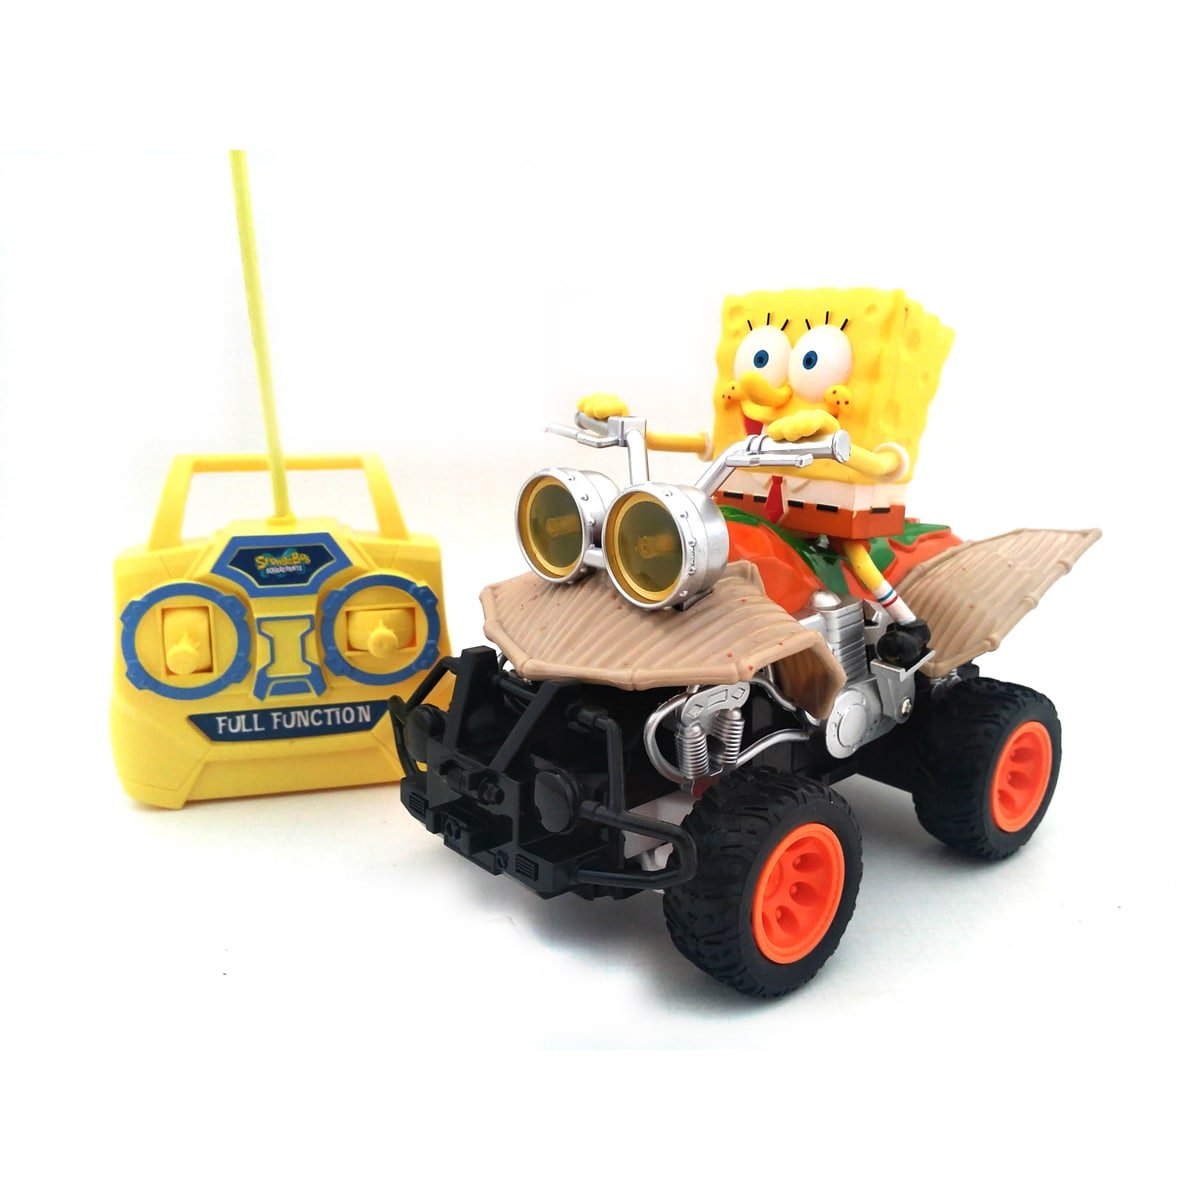 "Nkok Full Function Remote Control SpongeBob Squarepants ""SpongeBob ATV"" by Overstock"